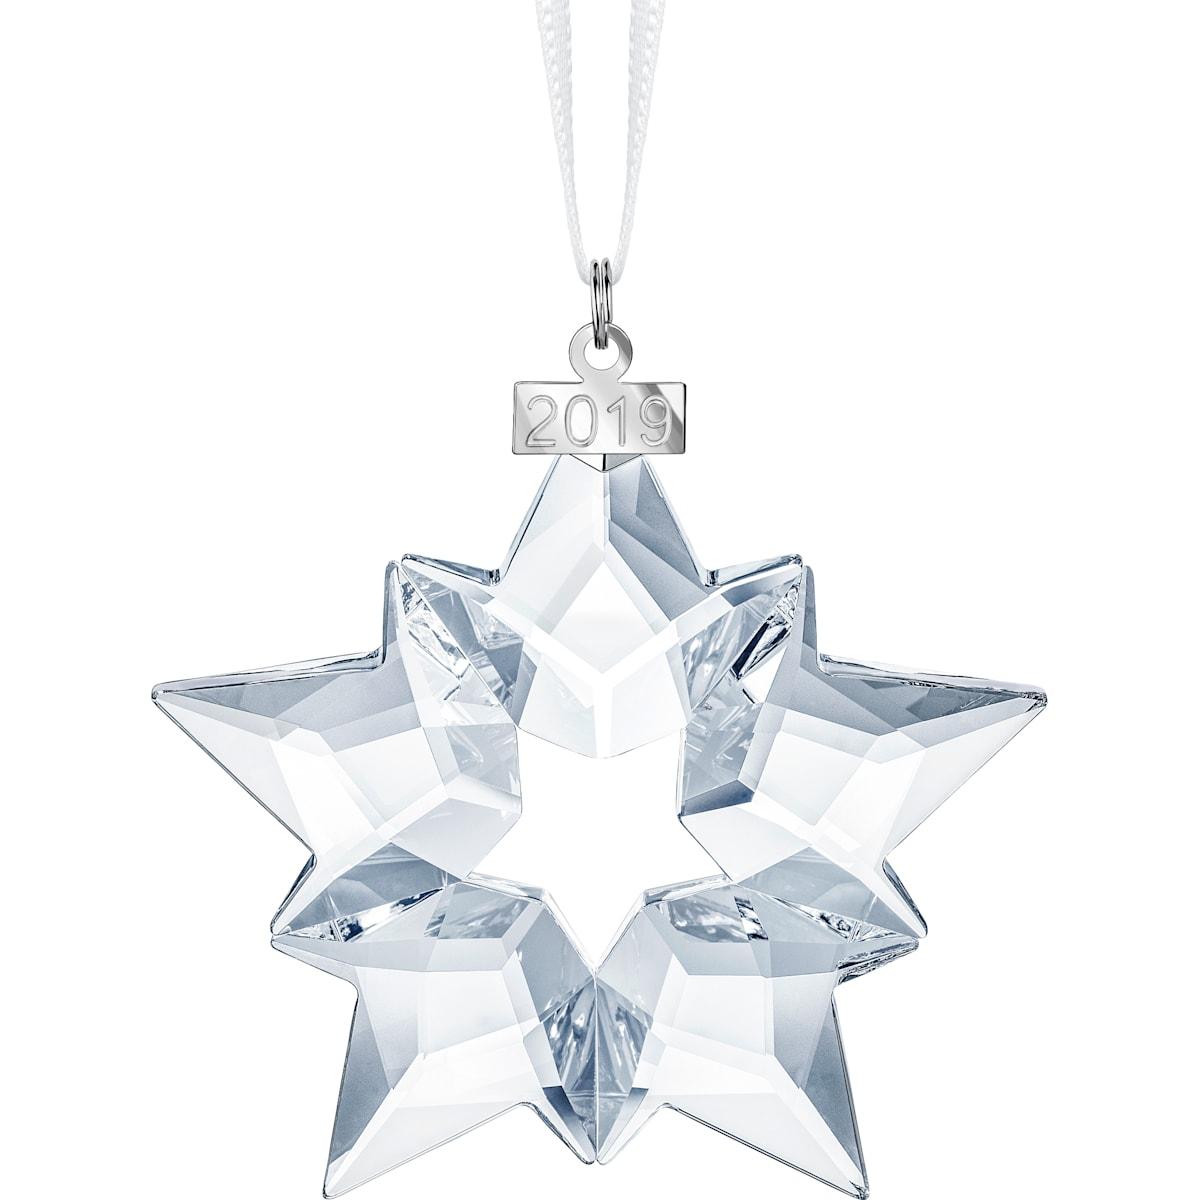 swarovski-annual-edition-ornament-2019-2.875-x-2.75-x0.25-in-5427990-2019.jpg